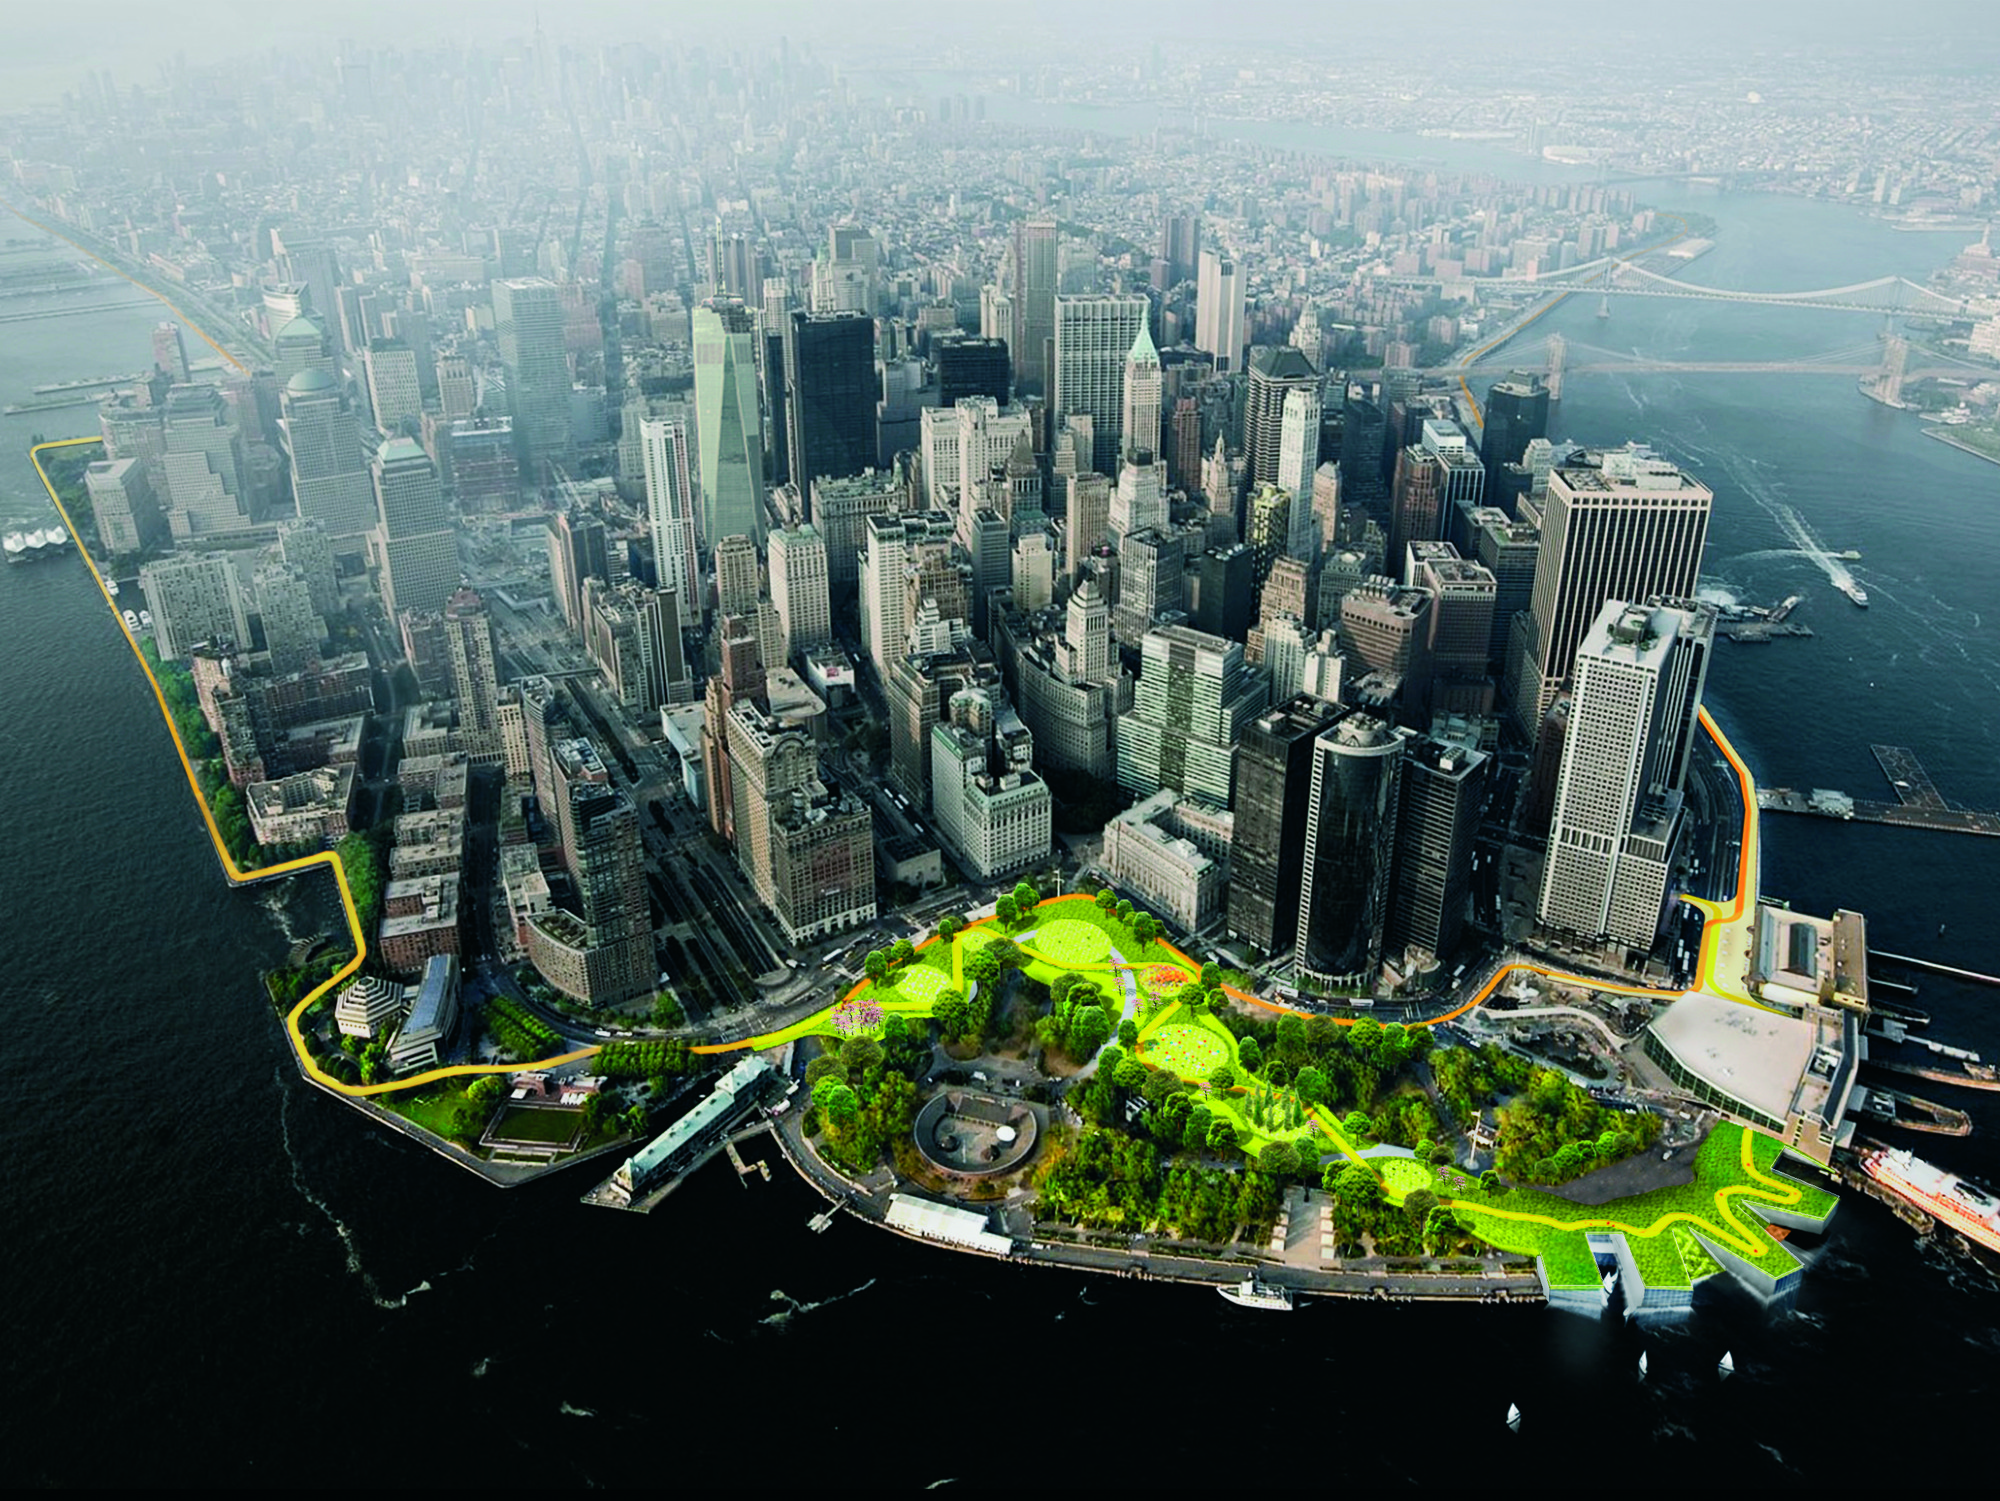 Tercer lugar: 'The Dryline' en Nueva York. Image Cortesia de Holcim Foundation